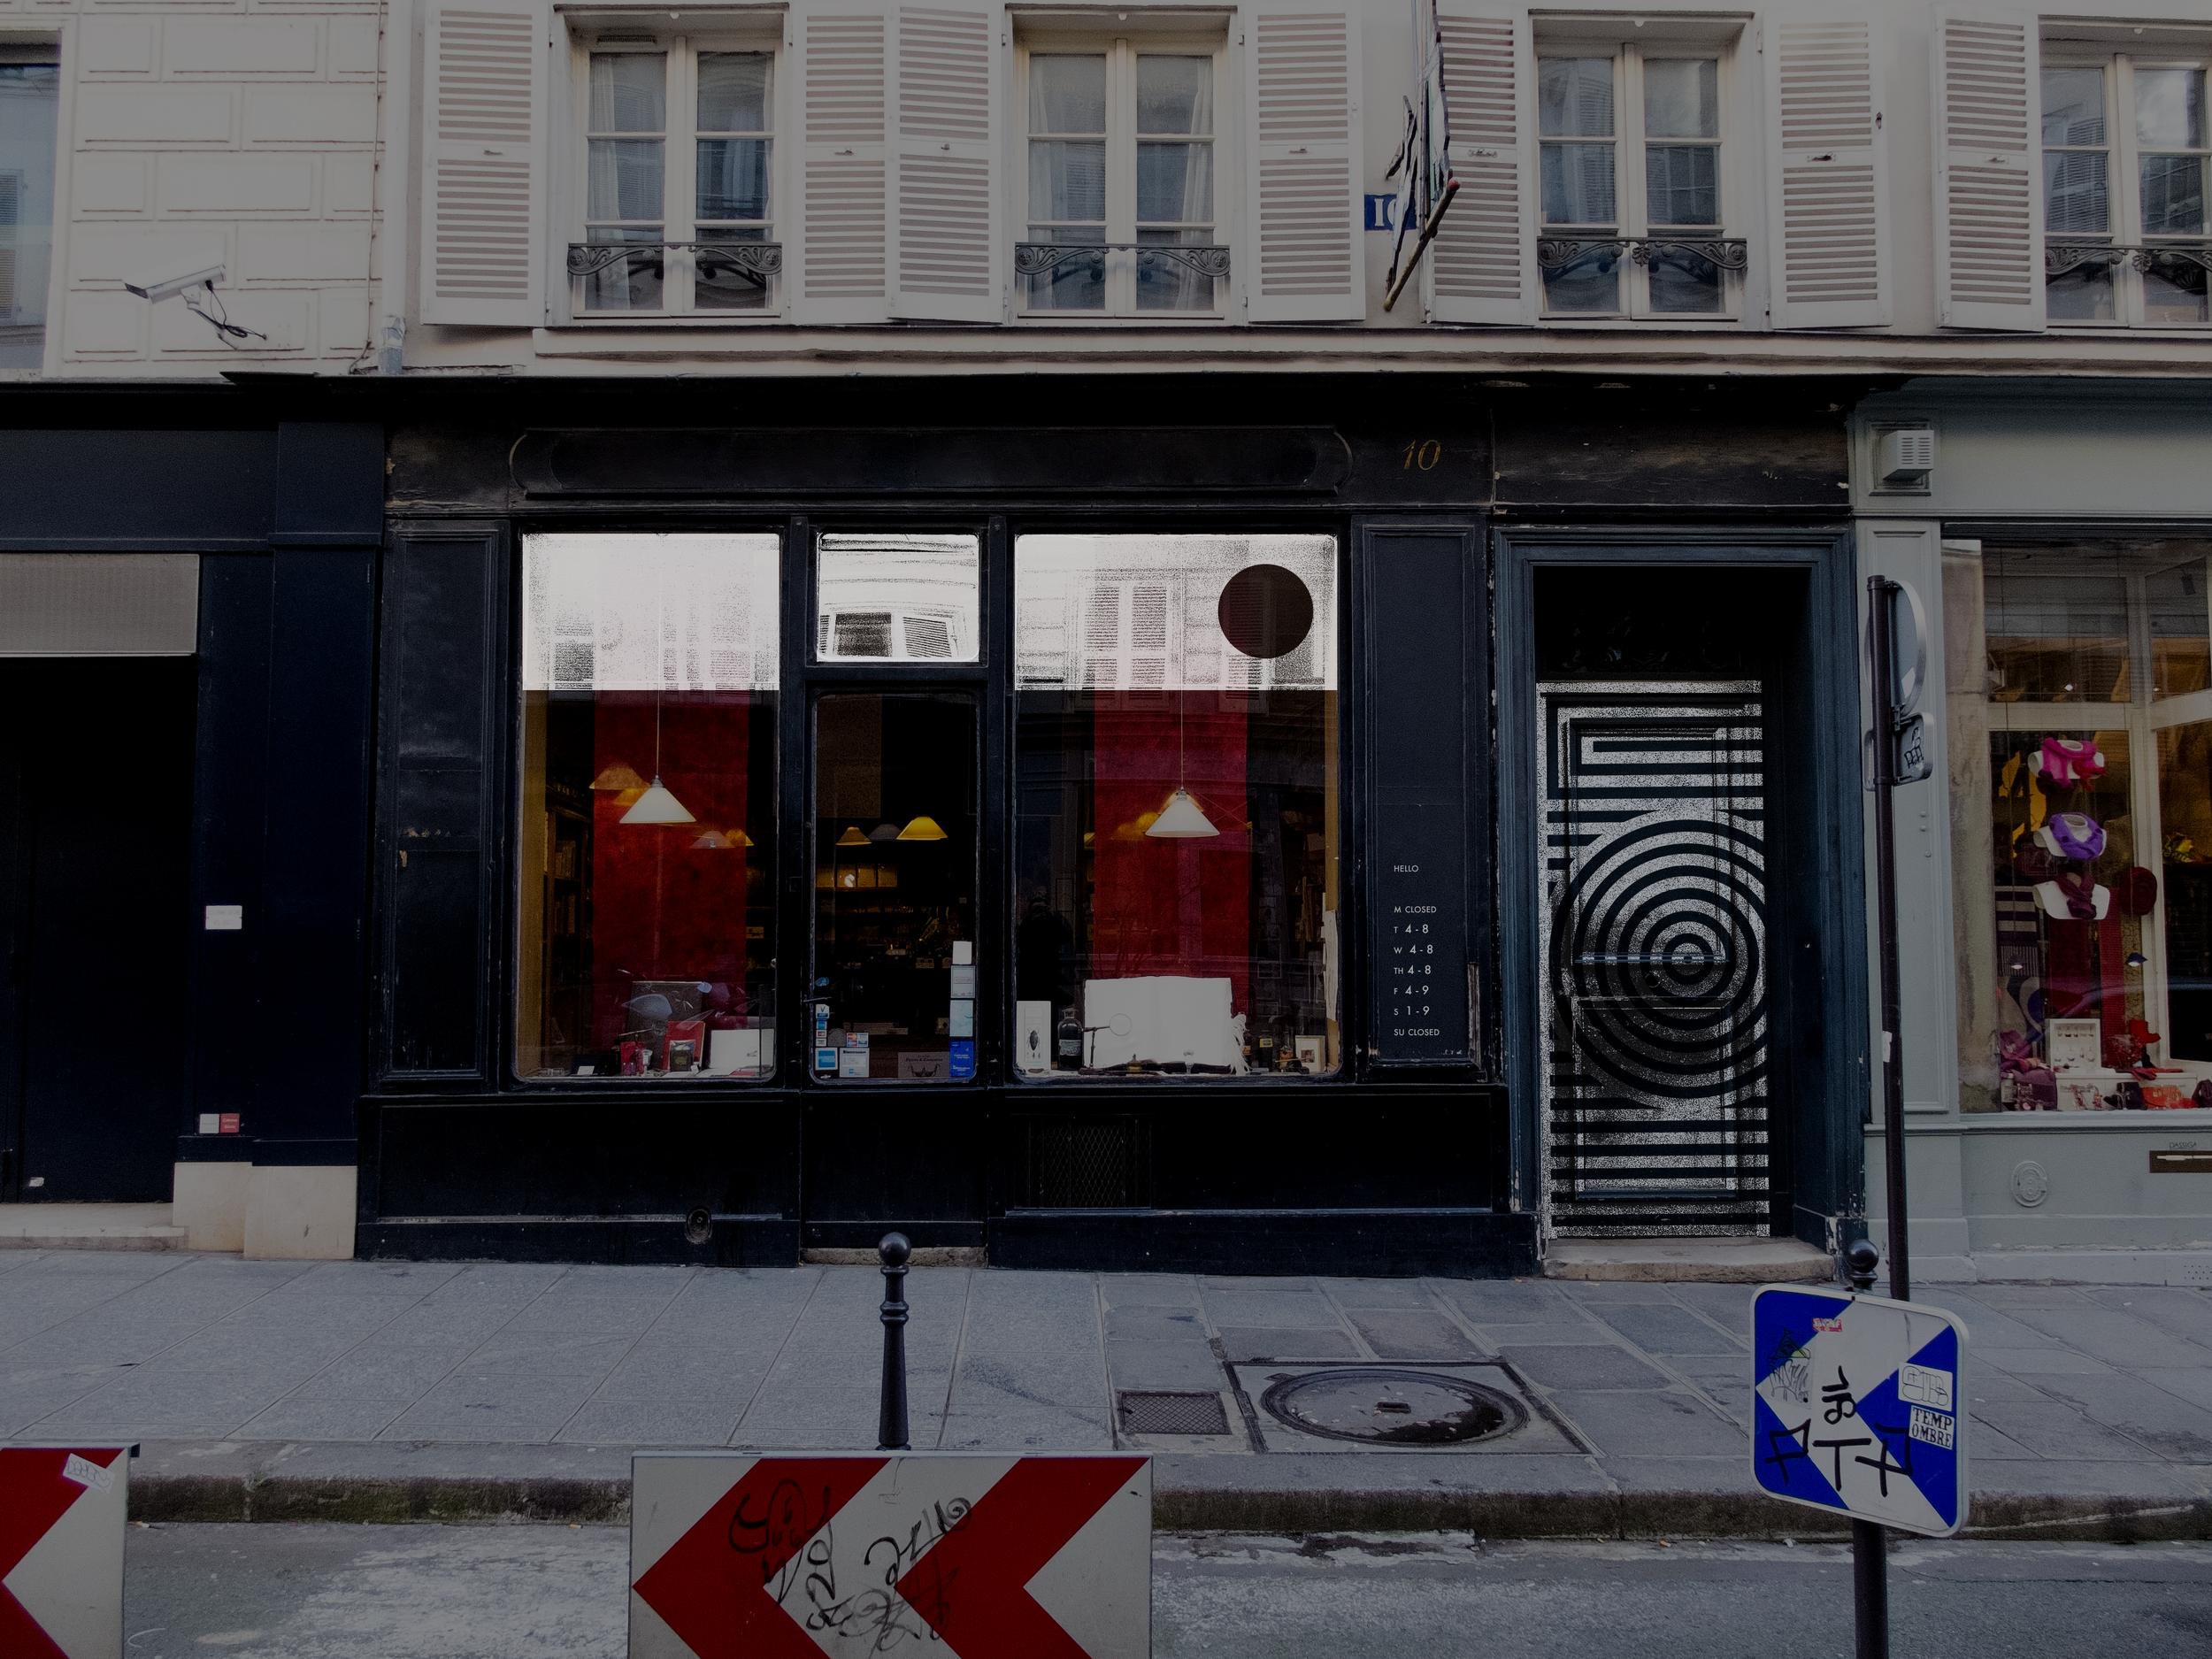 linedot_02_facade_150824.png